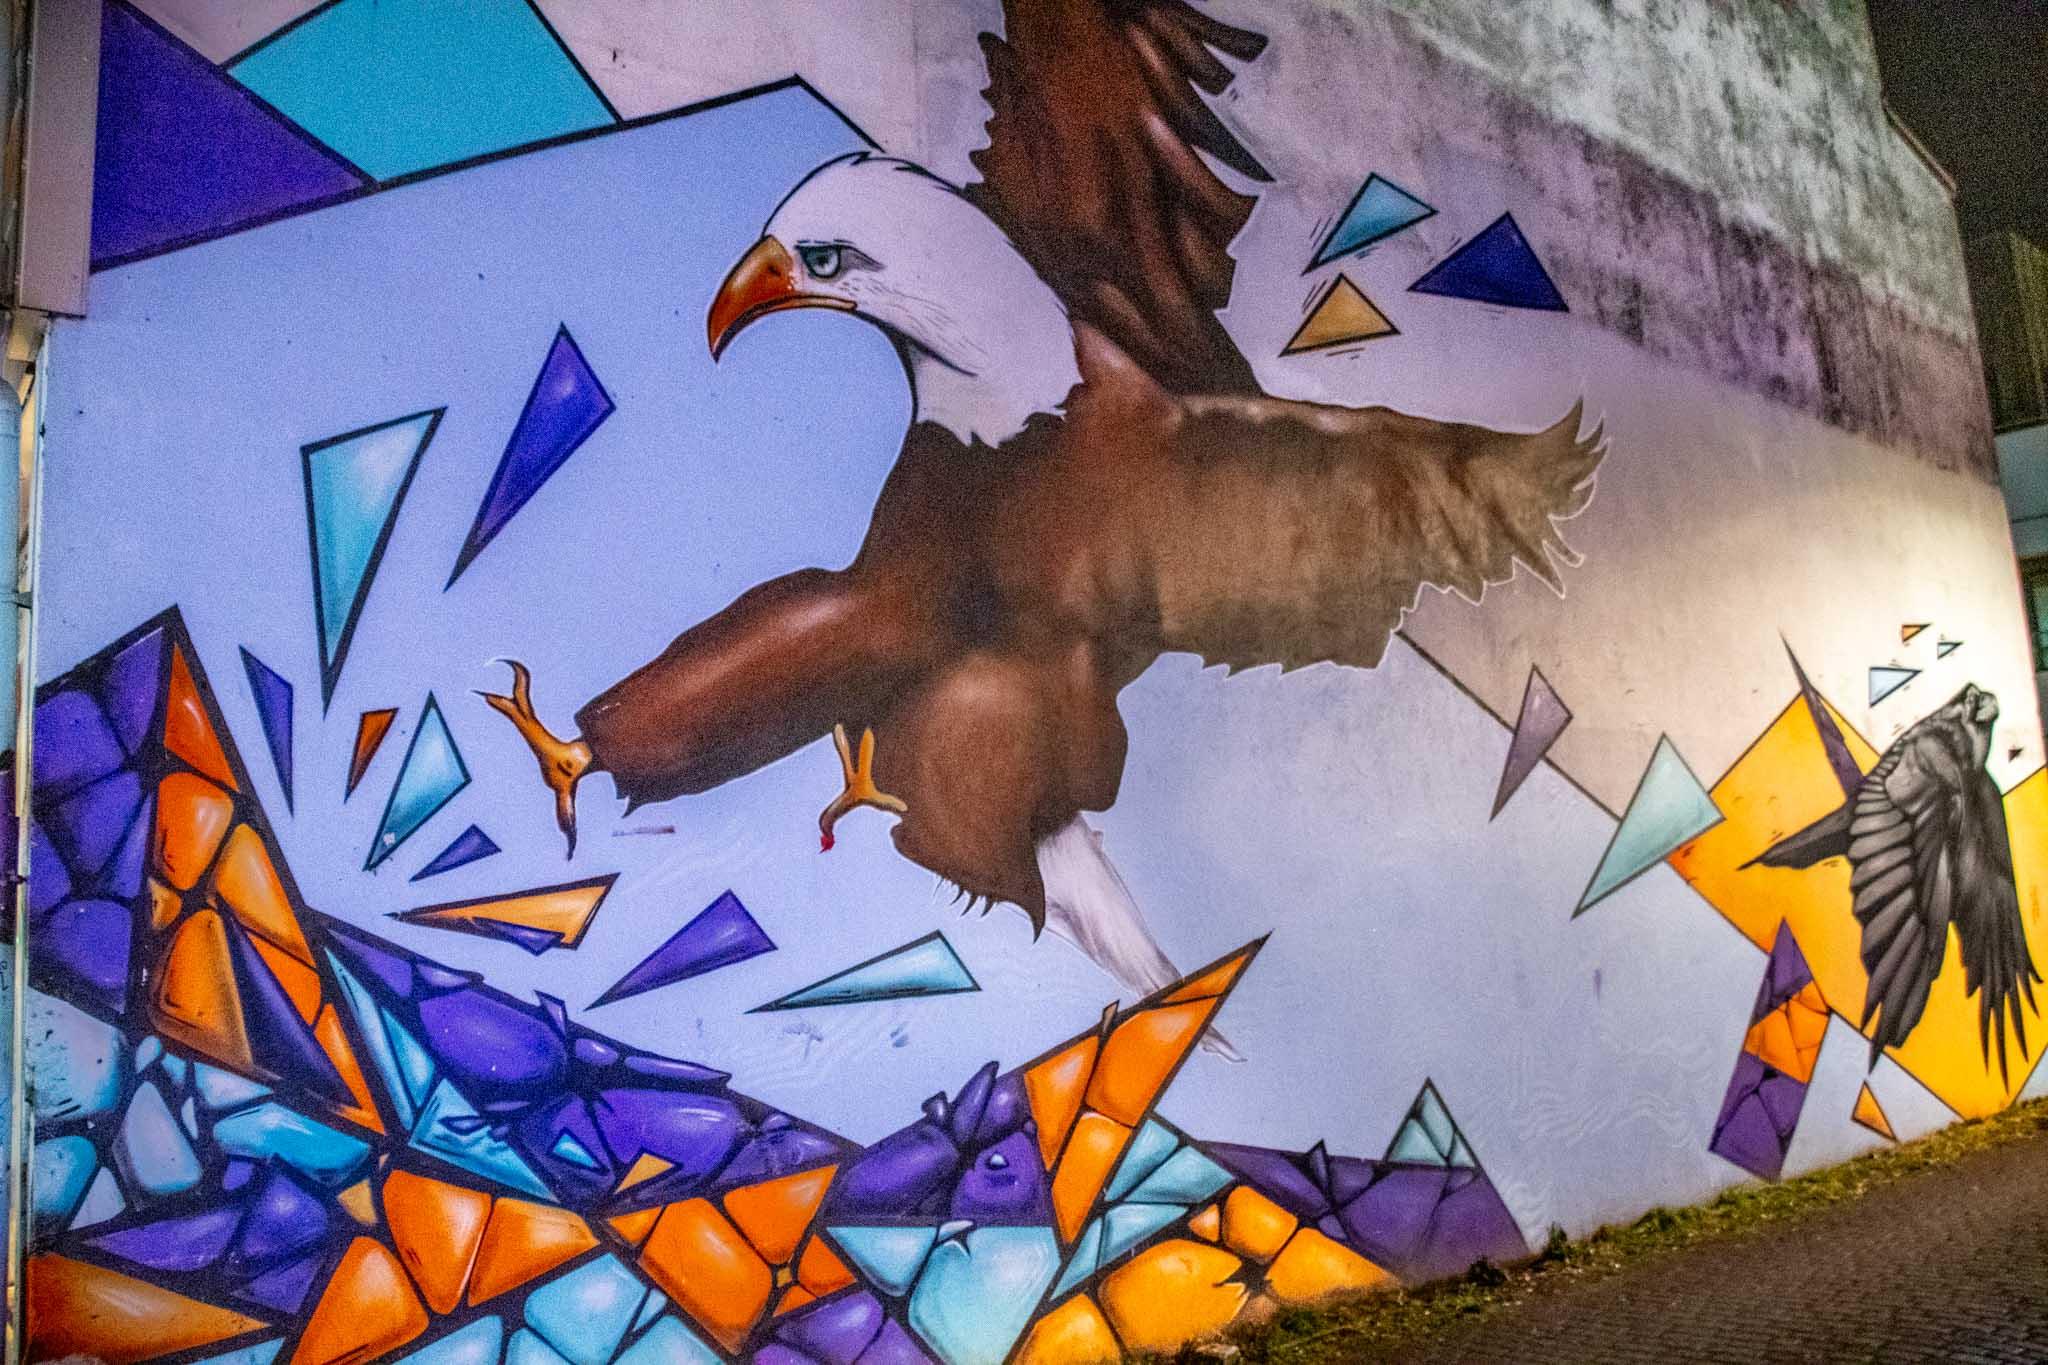 An Eagle mural in Reykjavik